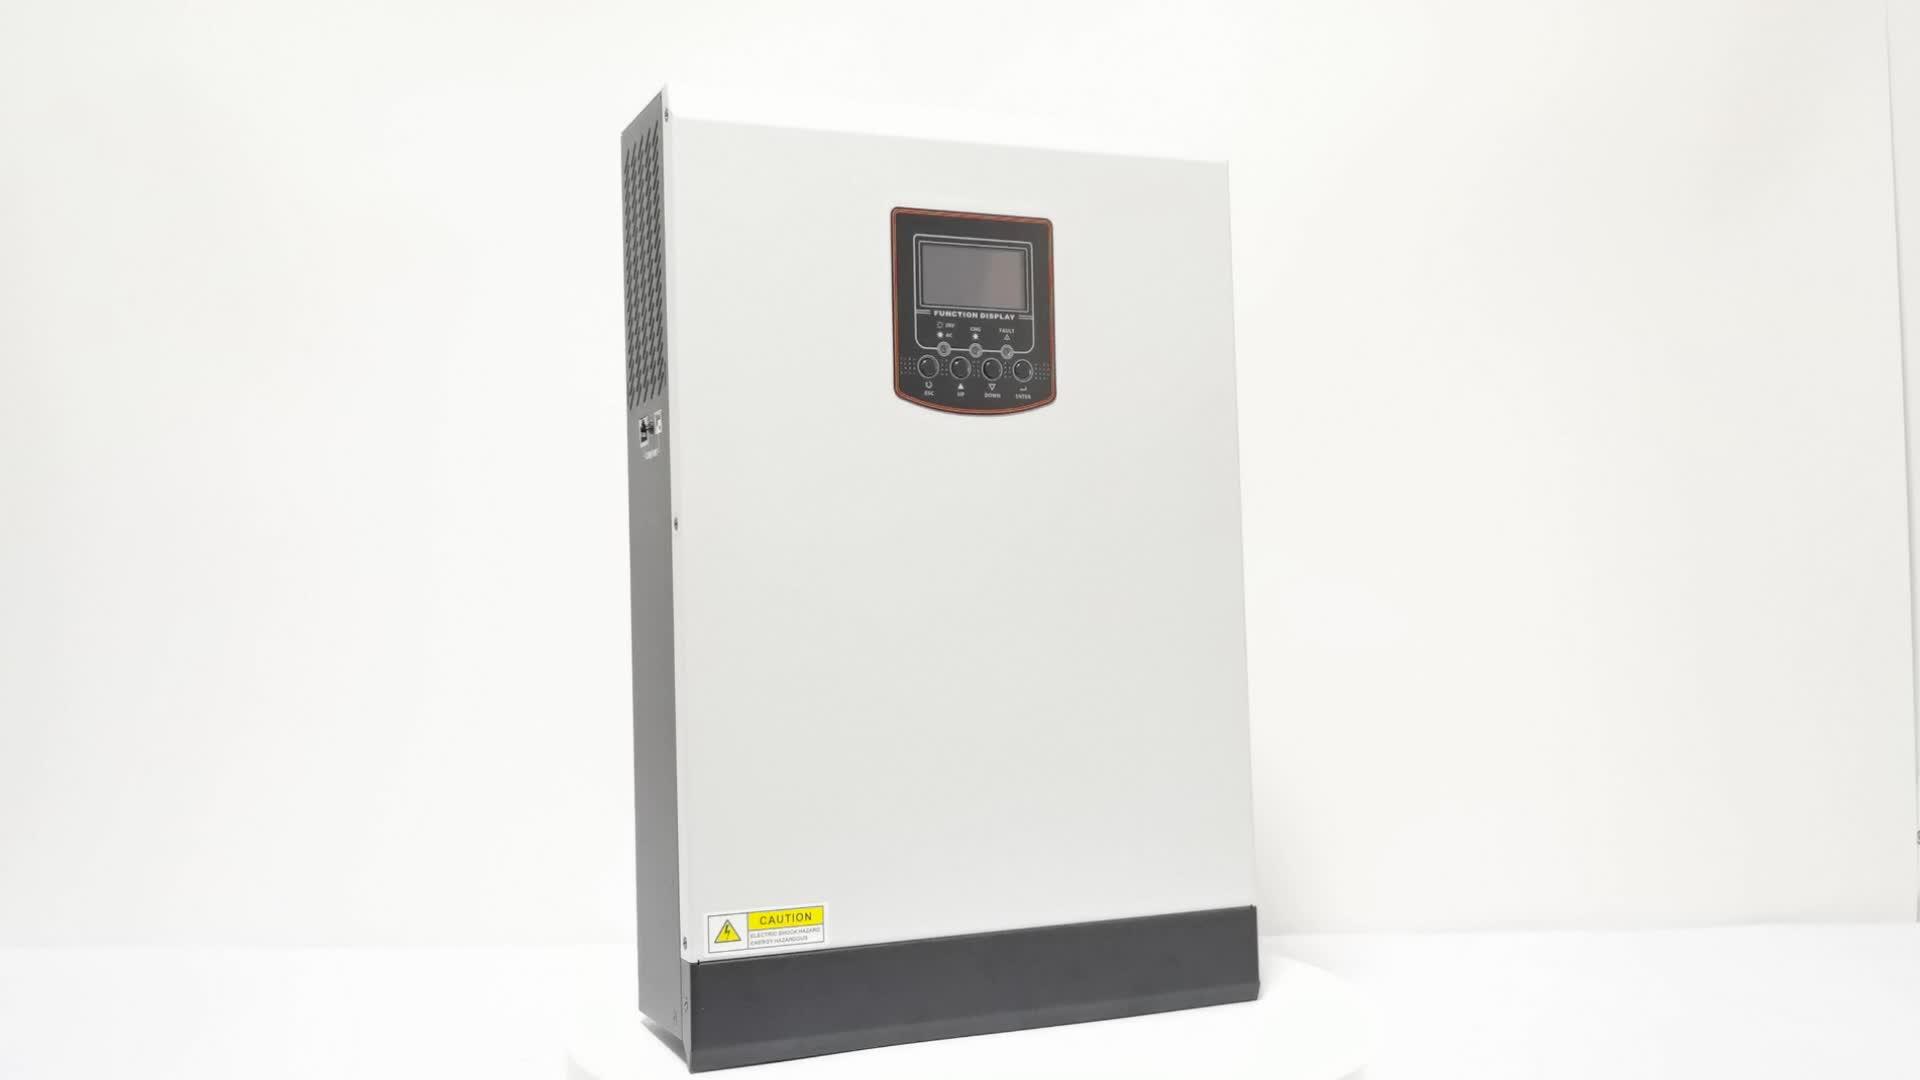 300watt Foldable Panels 300w 500w 1000w 2000w 3000w 5000w